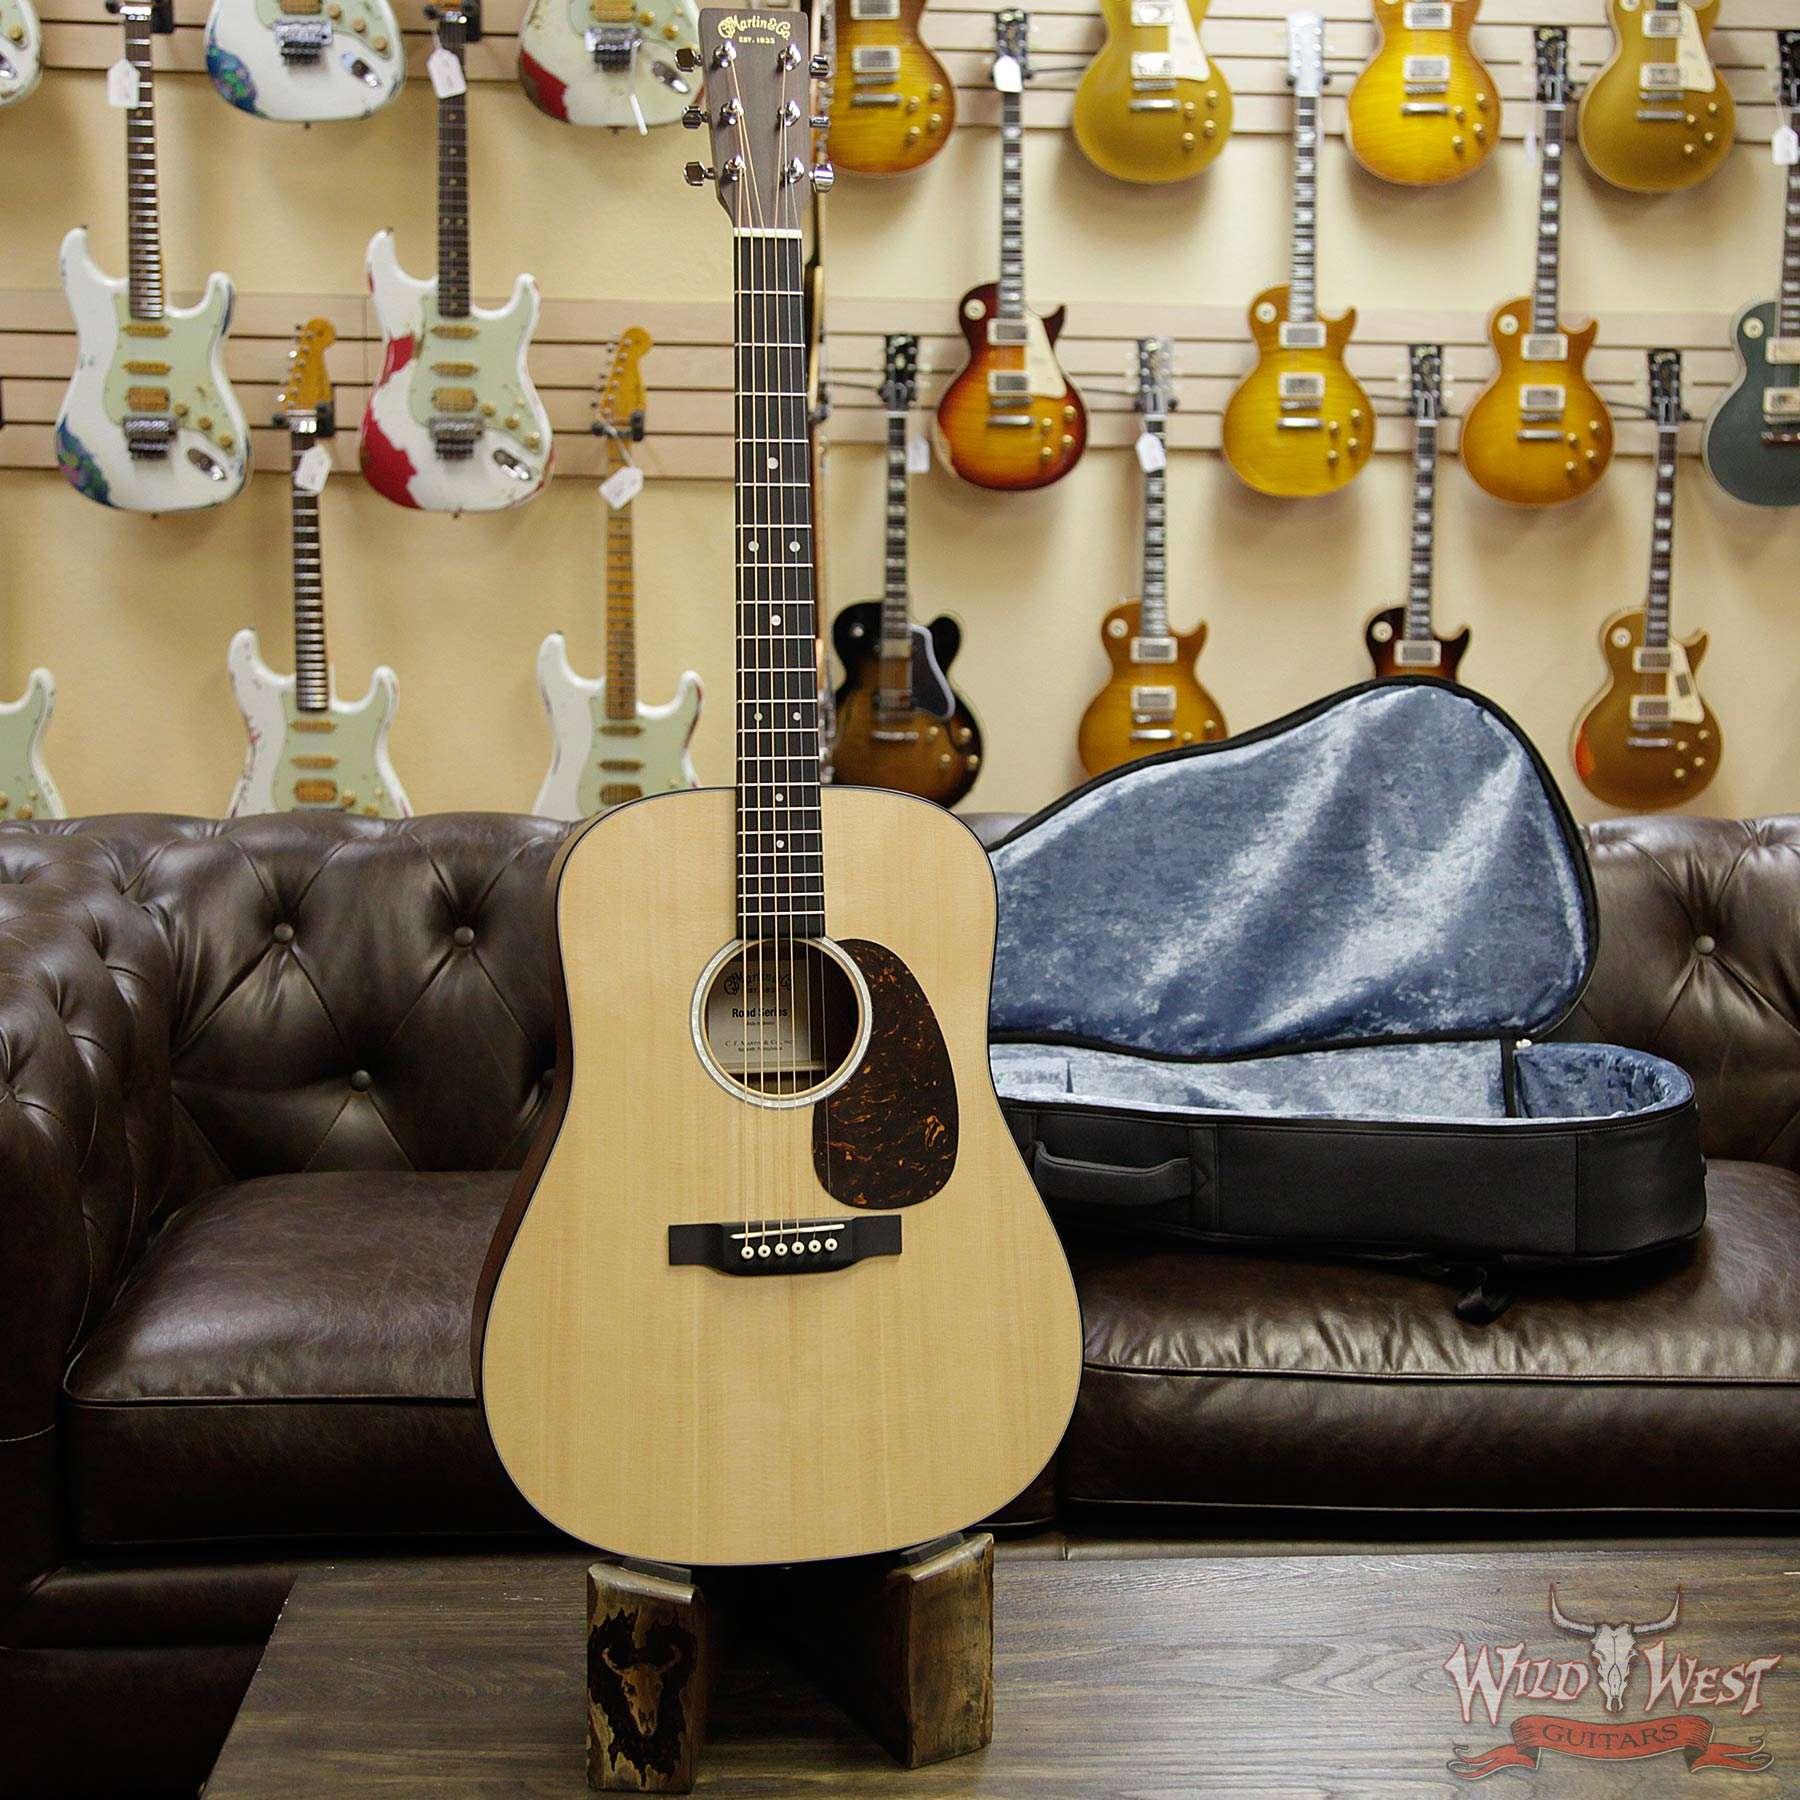 martin road series 2019 d 10e electric acoustic guitar natural wild west guitars. Black Bedroom Furniture Sets. Home Design Ideas